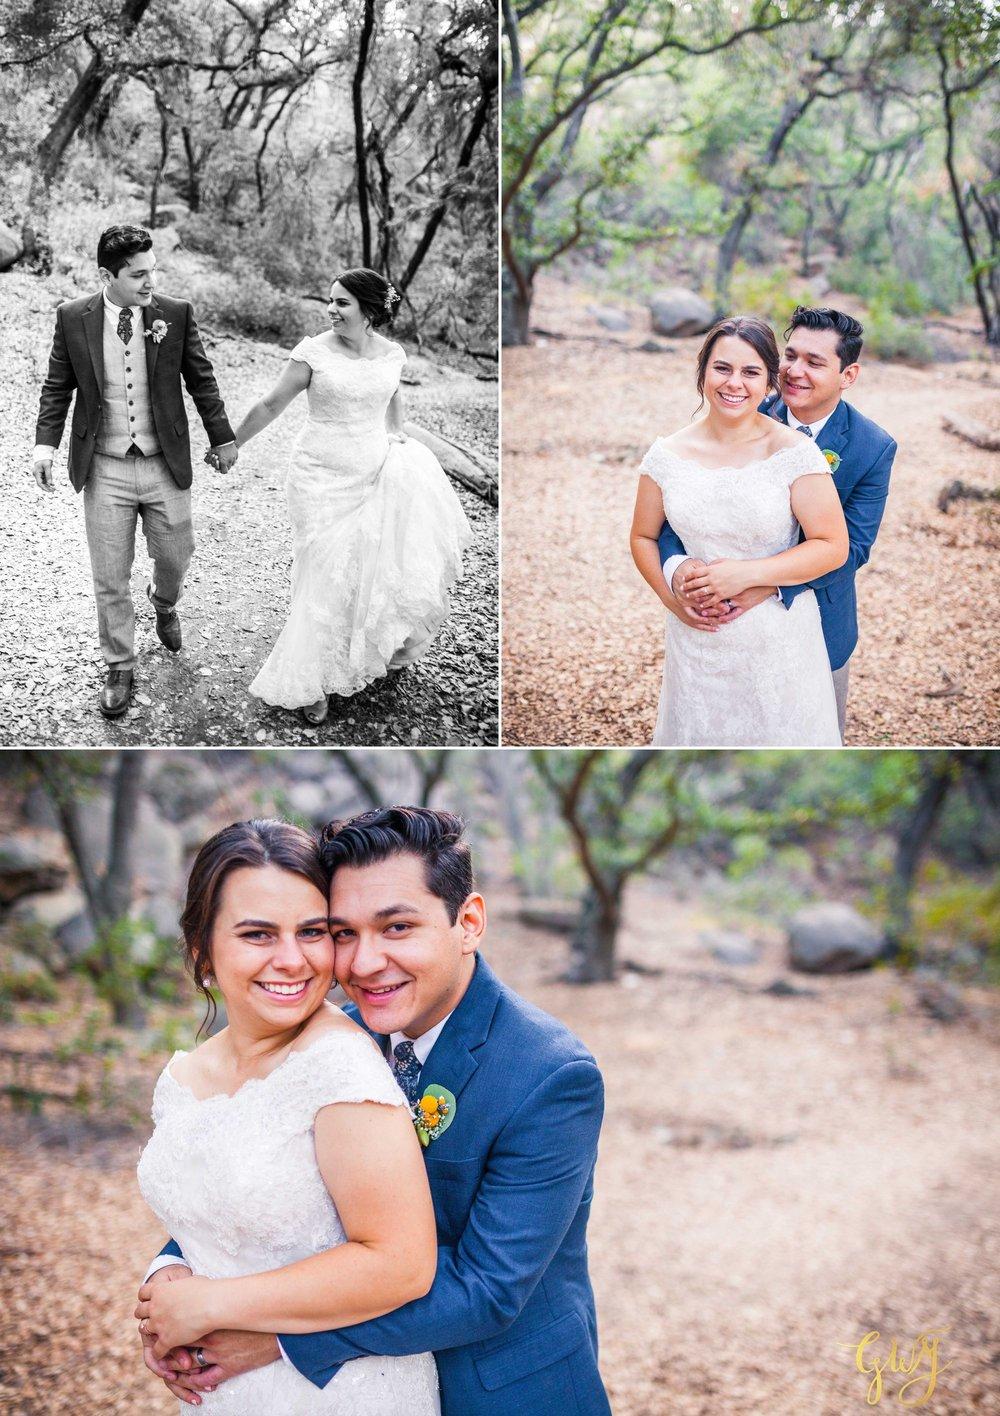 Hannah + Lorenzo Secluded Garden Estate Temecula DIY Wedding by Glass Woods Media 22.jpg